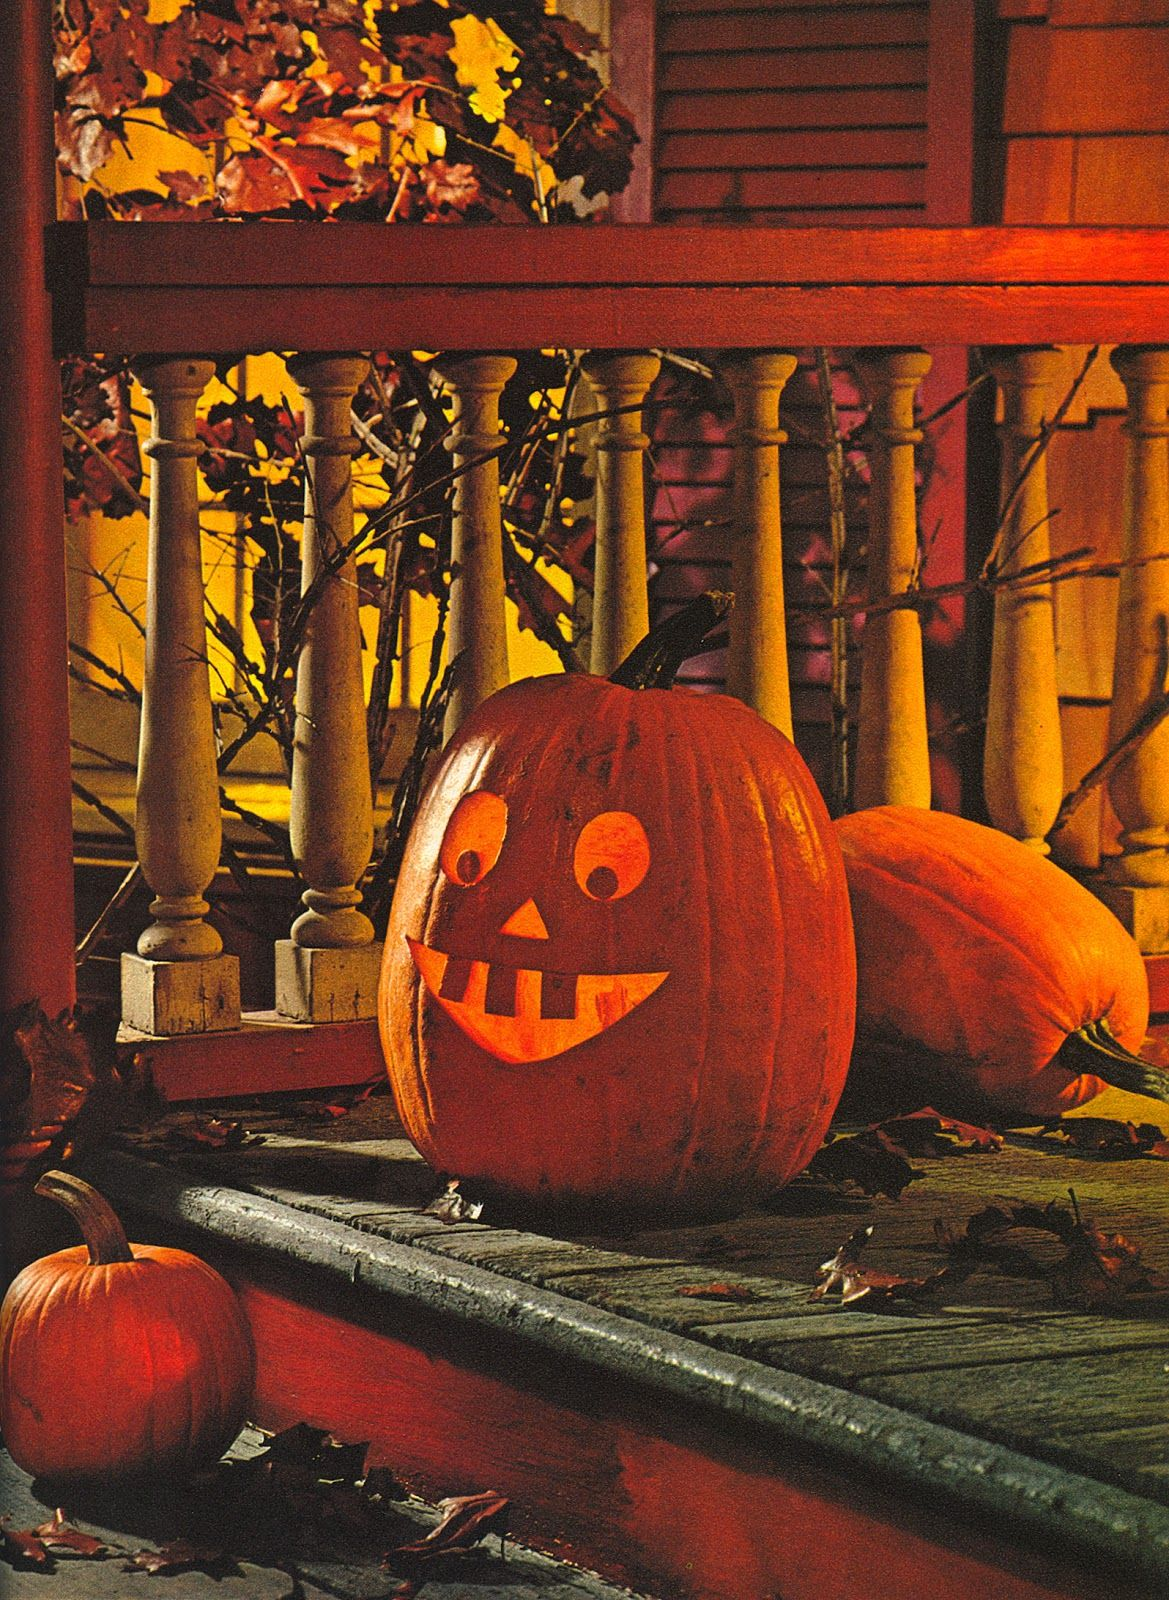 Halloween Ideals, 1977